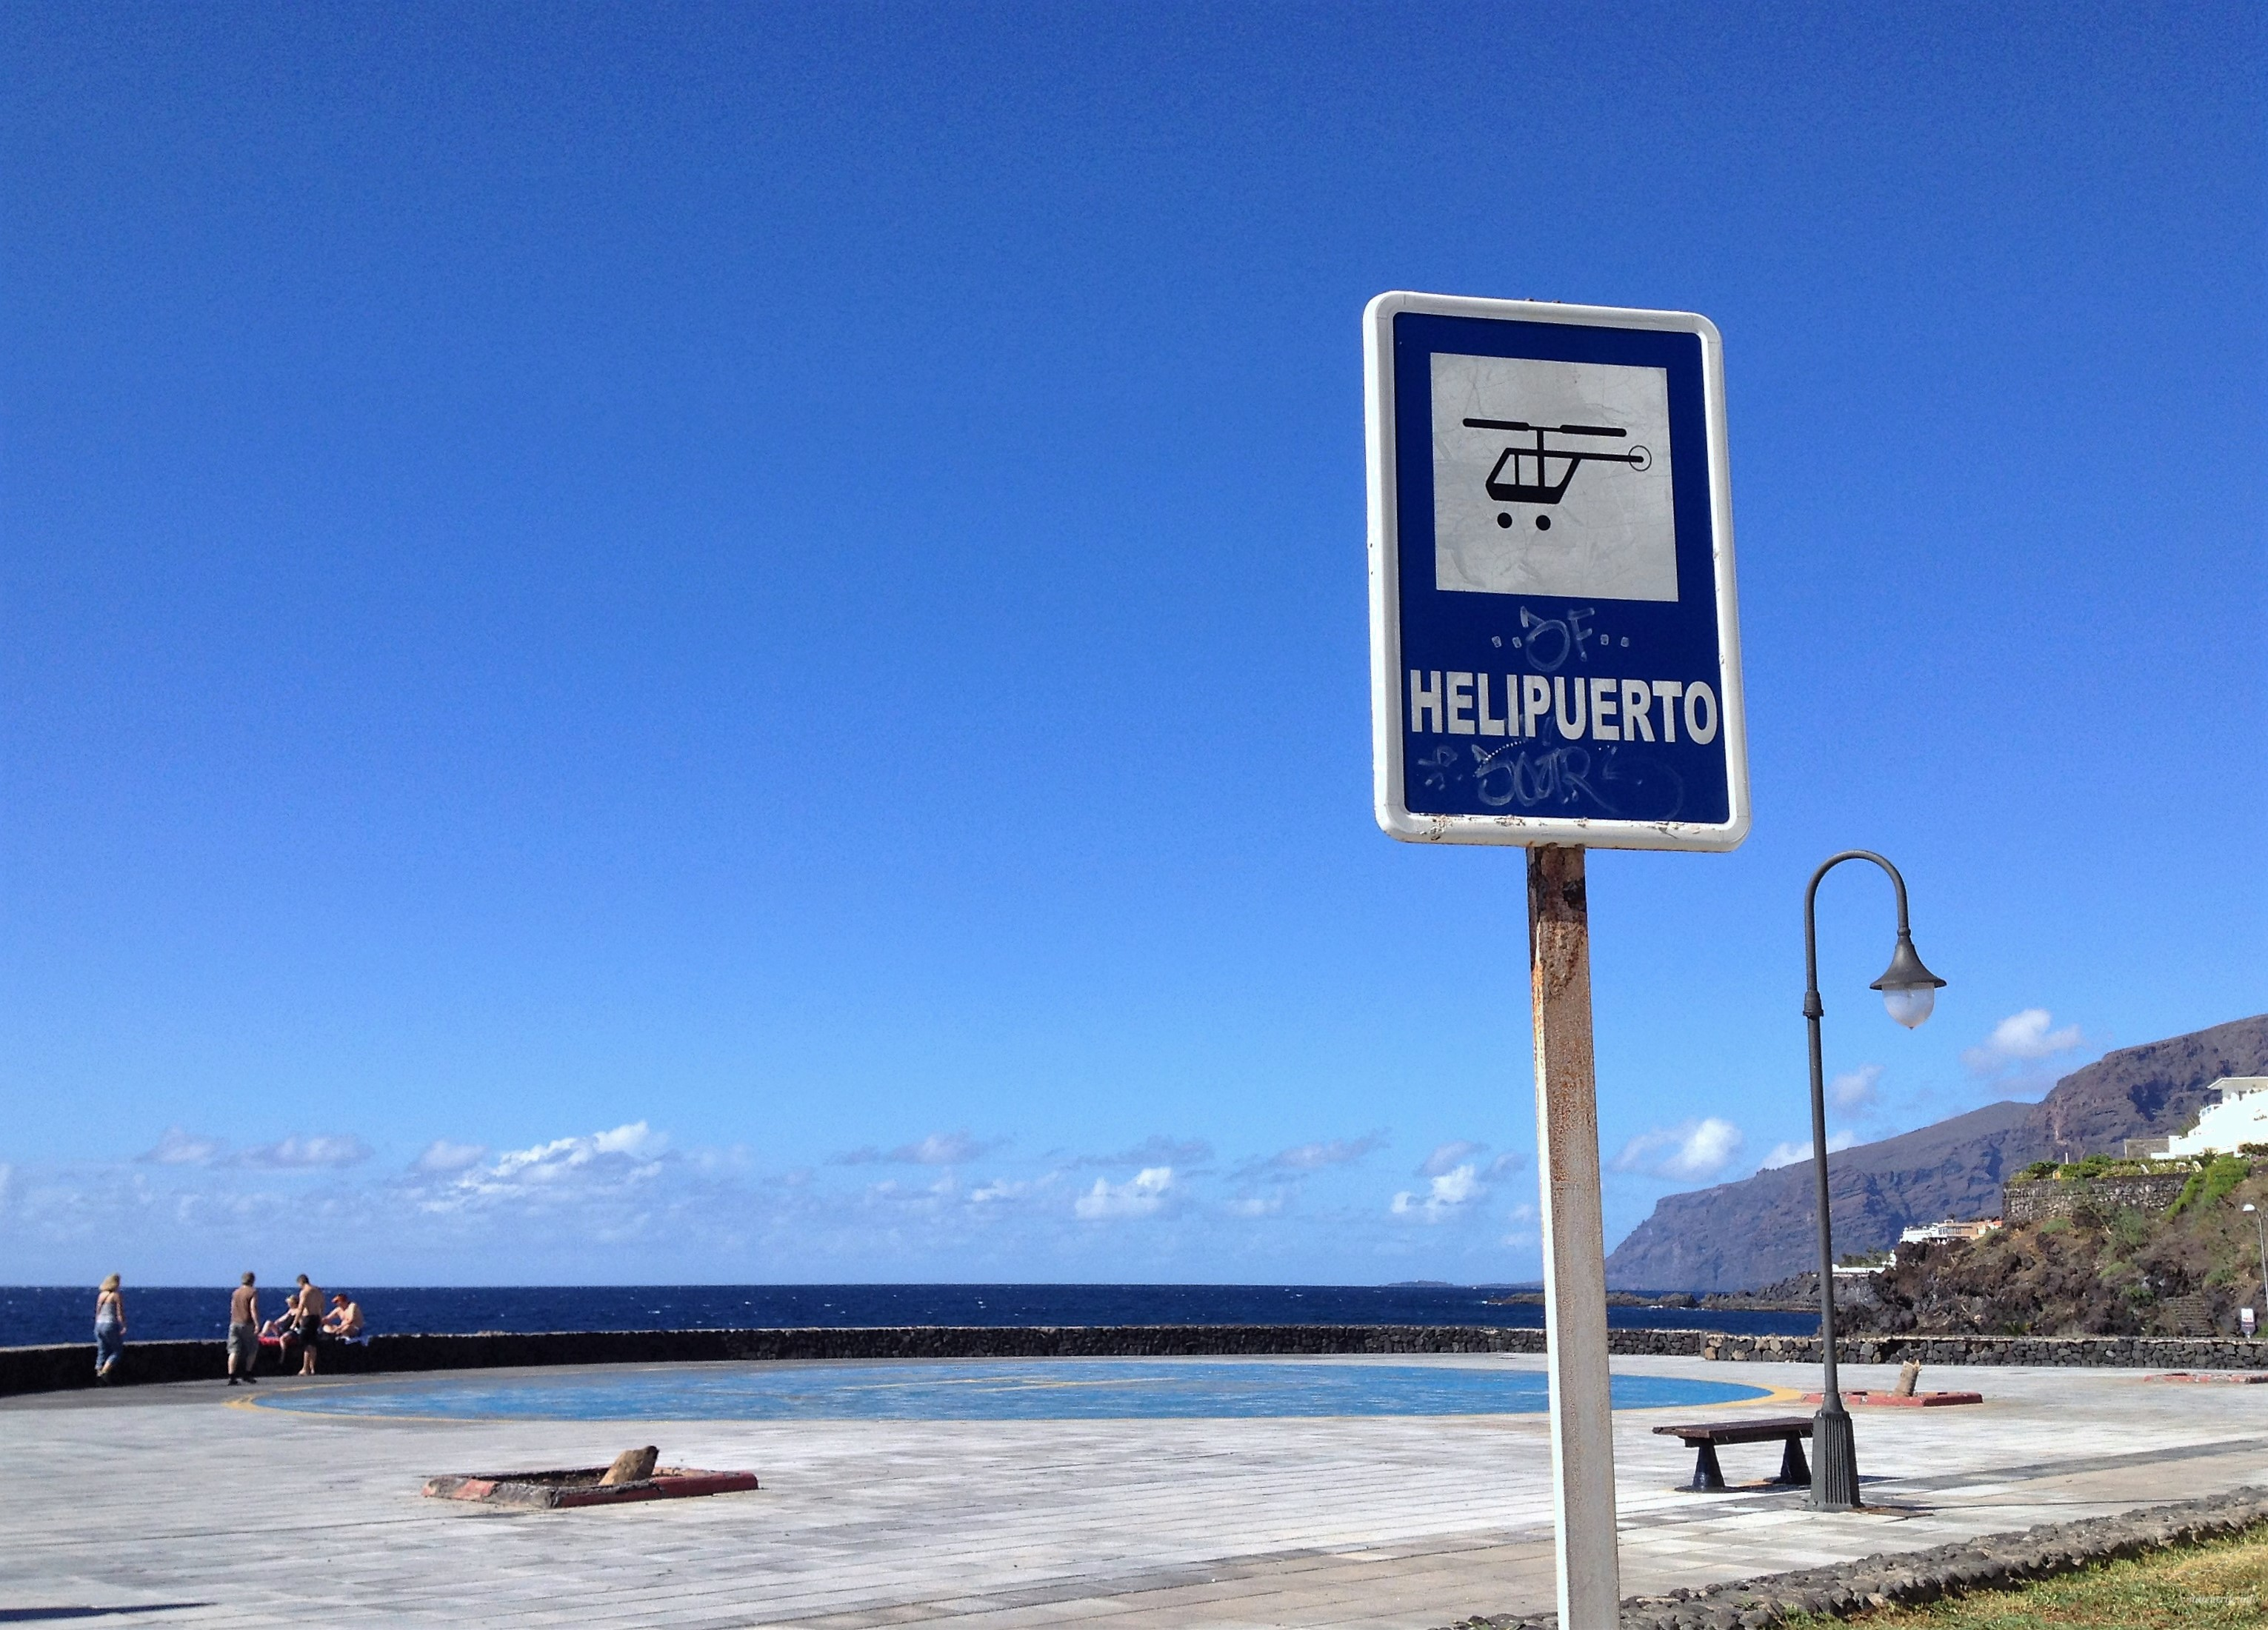 Пляж Нептуно, Тенерифе